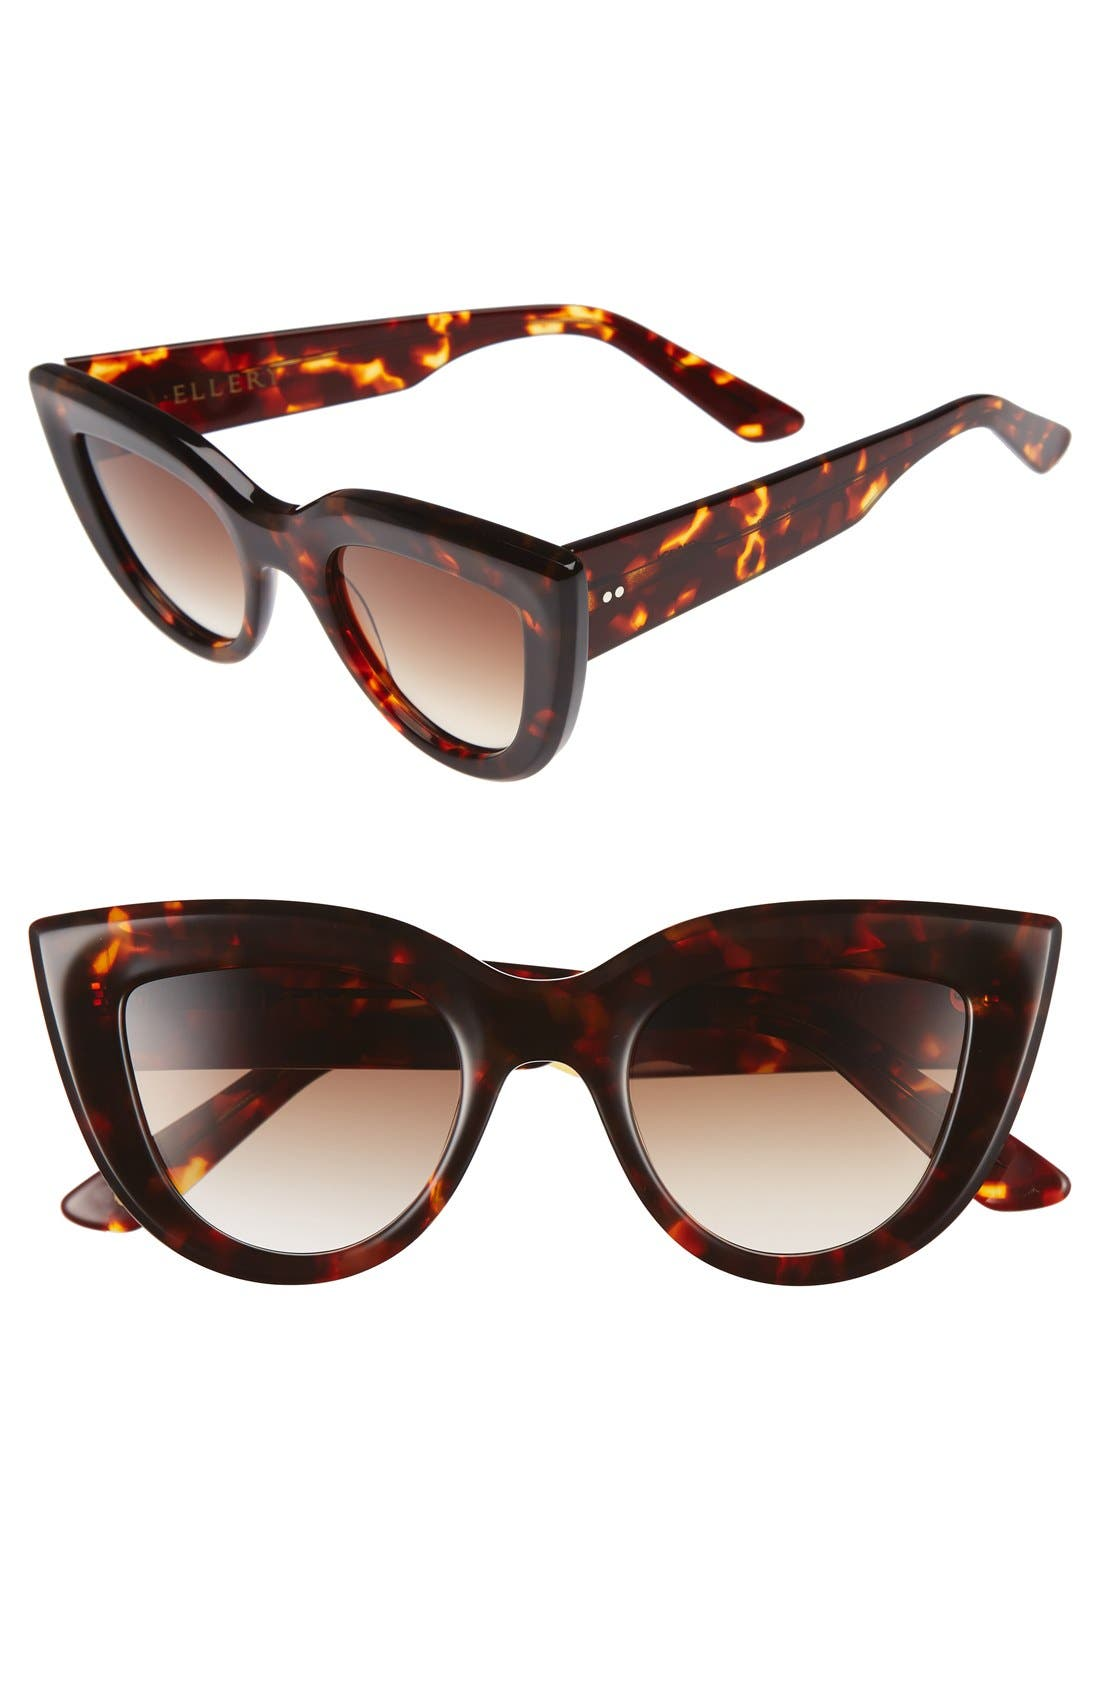 Alternate Image 1 Selected - ELLERY 'Quixote Classic' 45mm Cat Eye Sunglasses